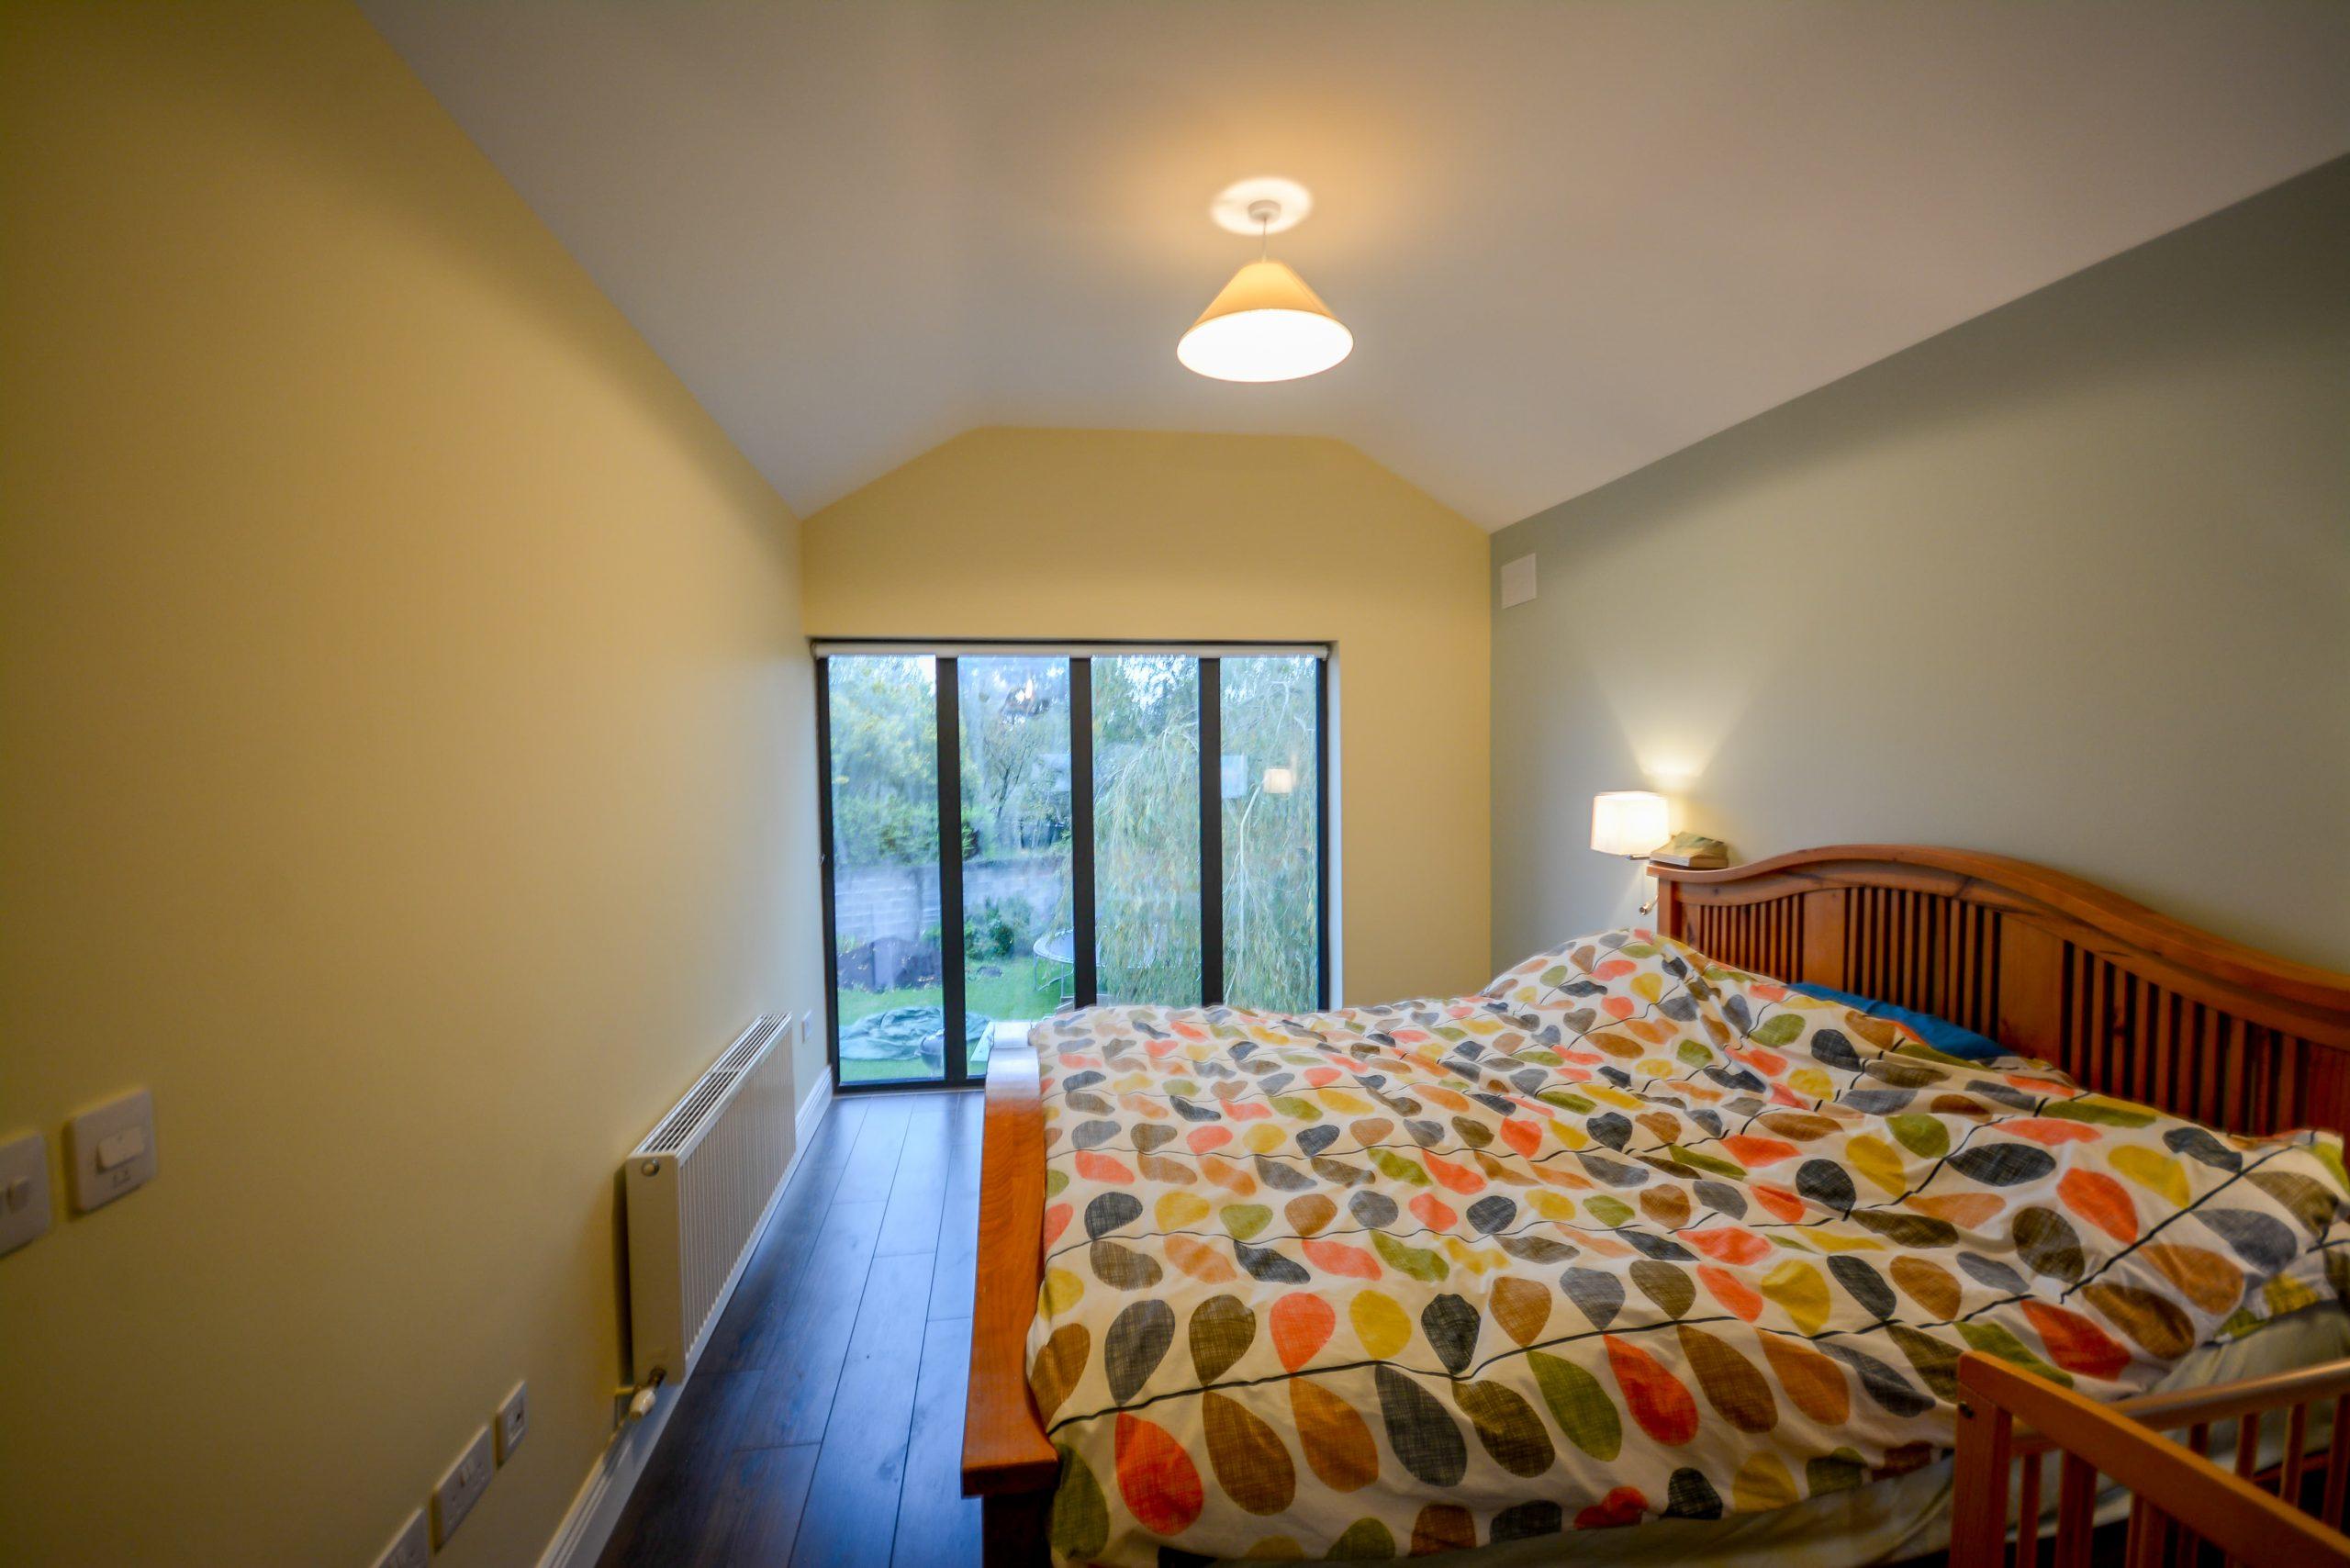 House Extension Bedroom Dublin Architect